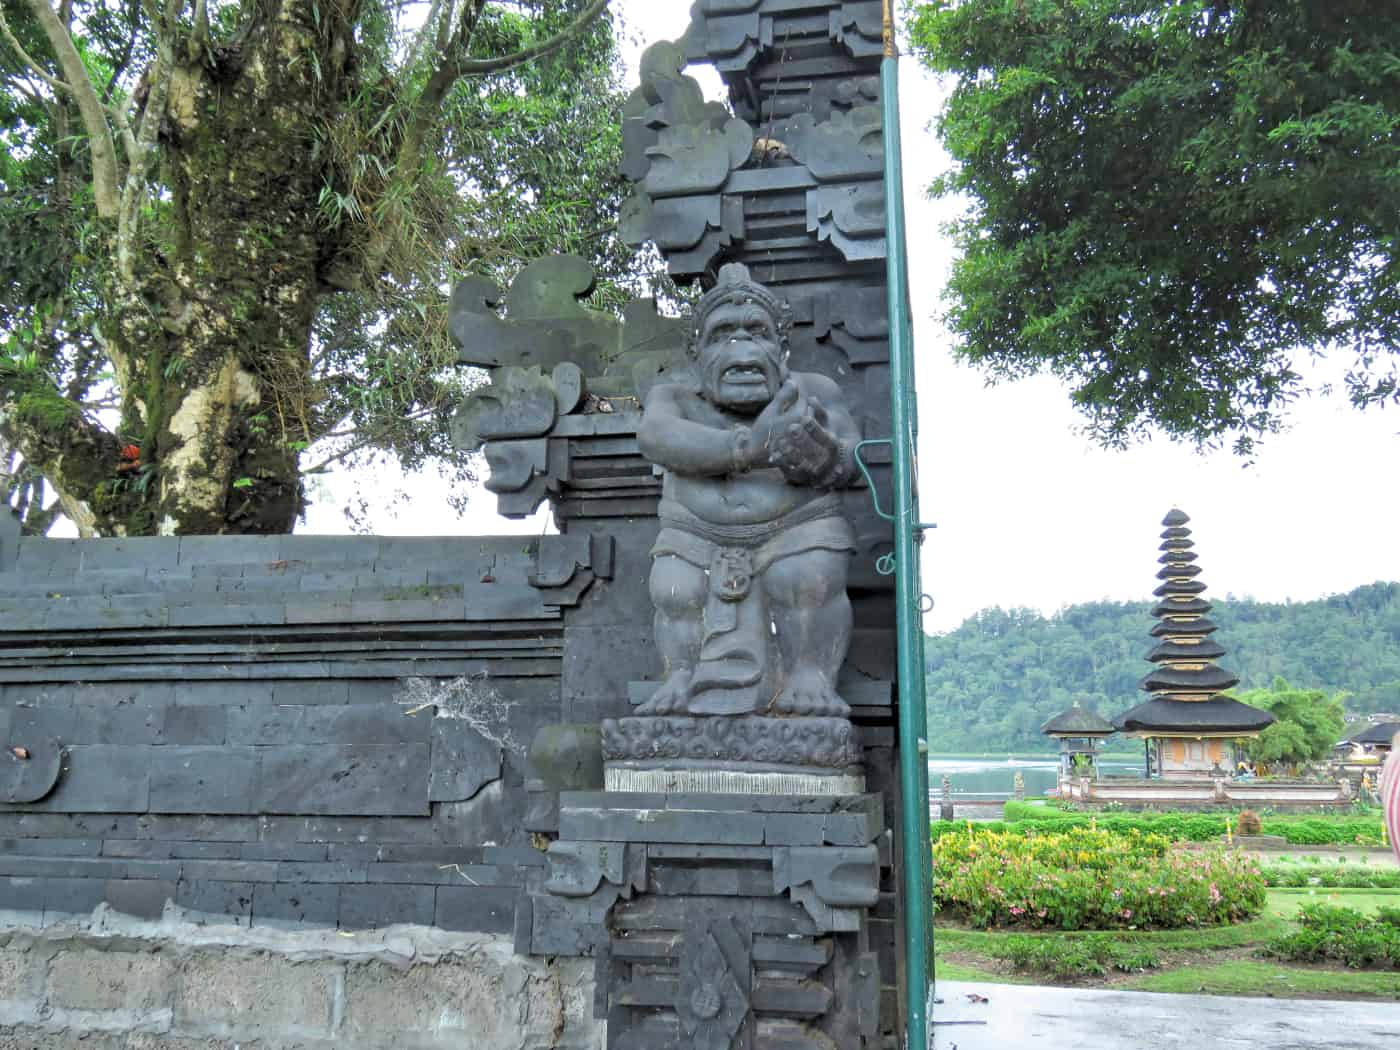 gogirlrun_bali_indonesien_privatetour_norden_Pura Ulun Danu Bratan_85